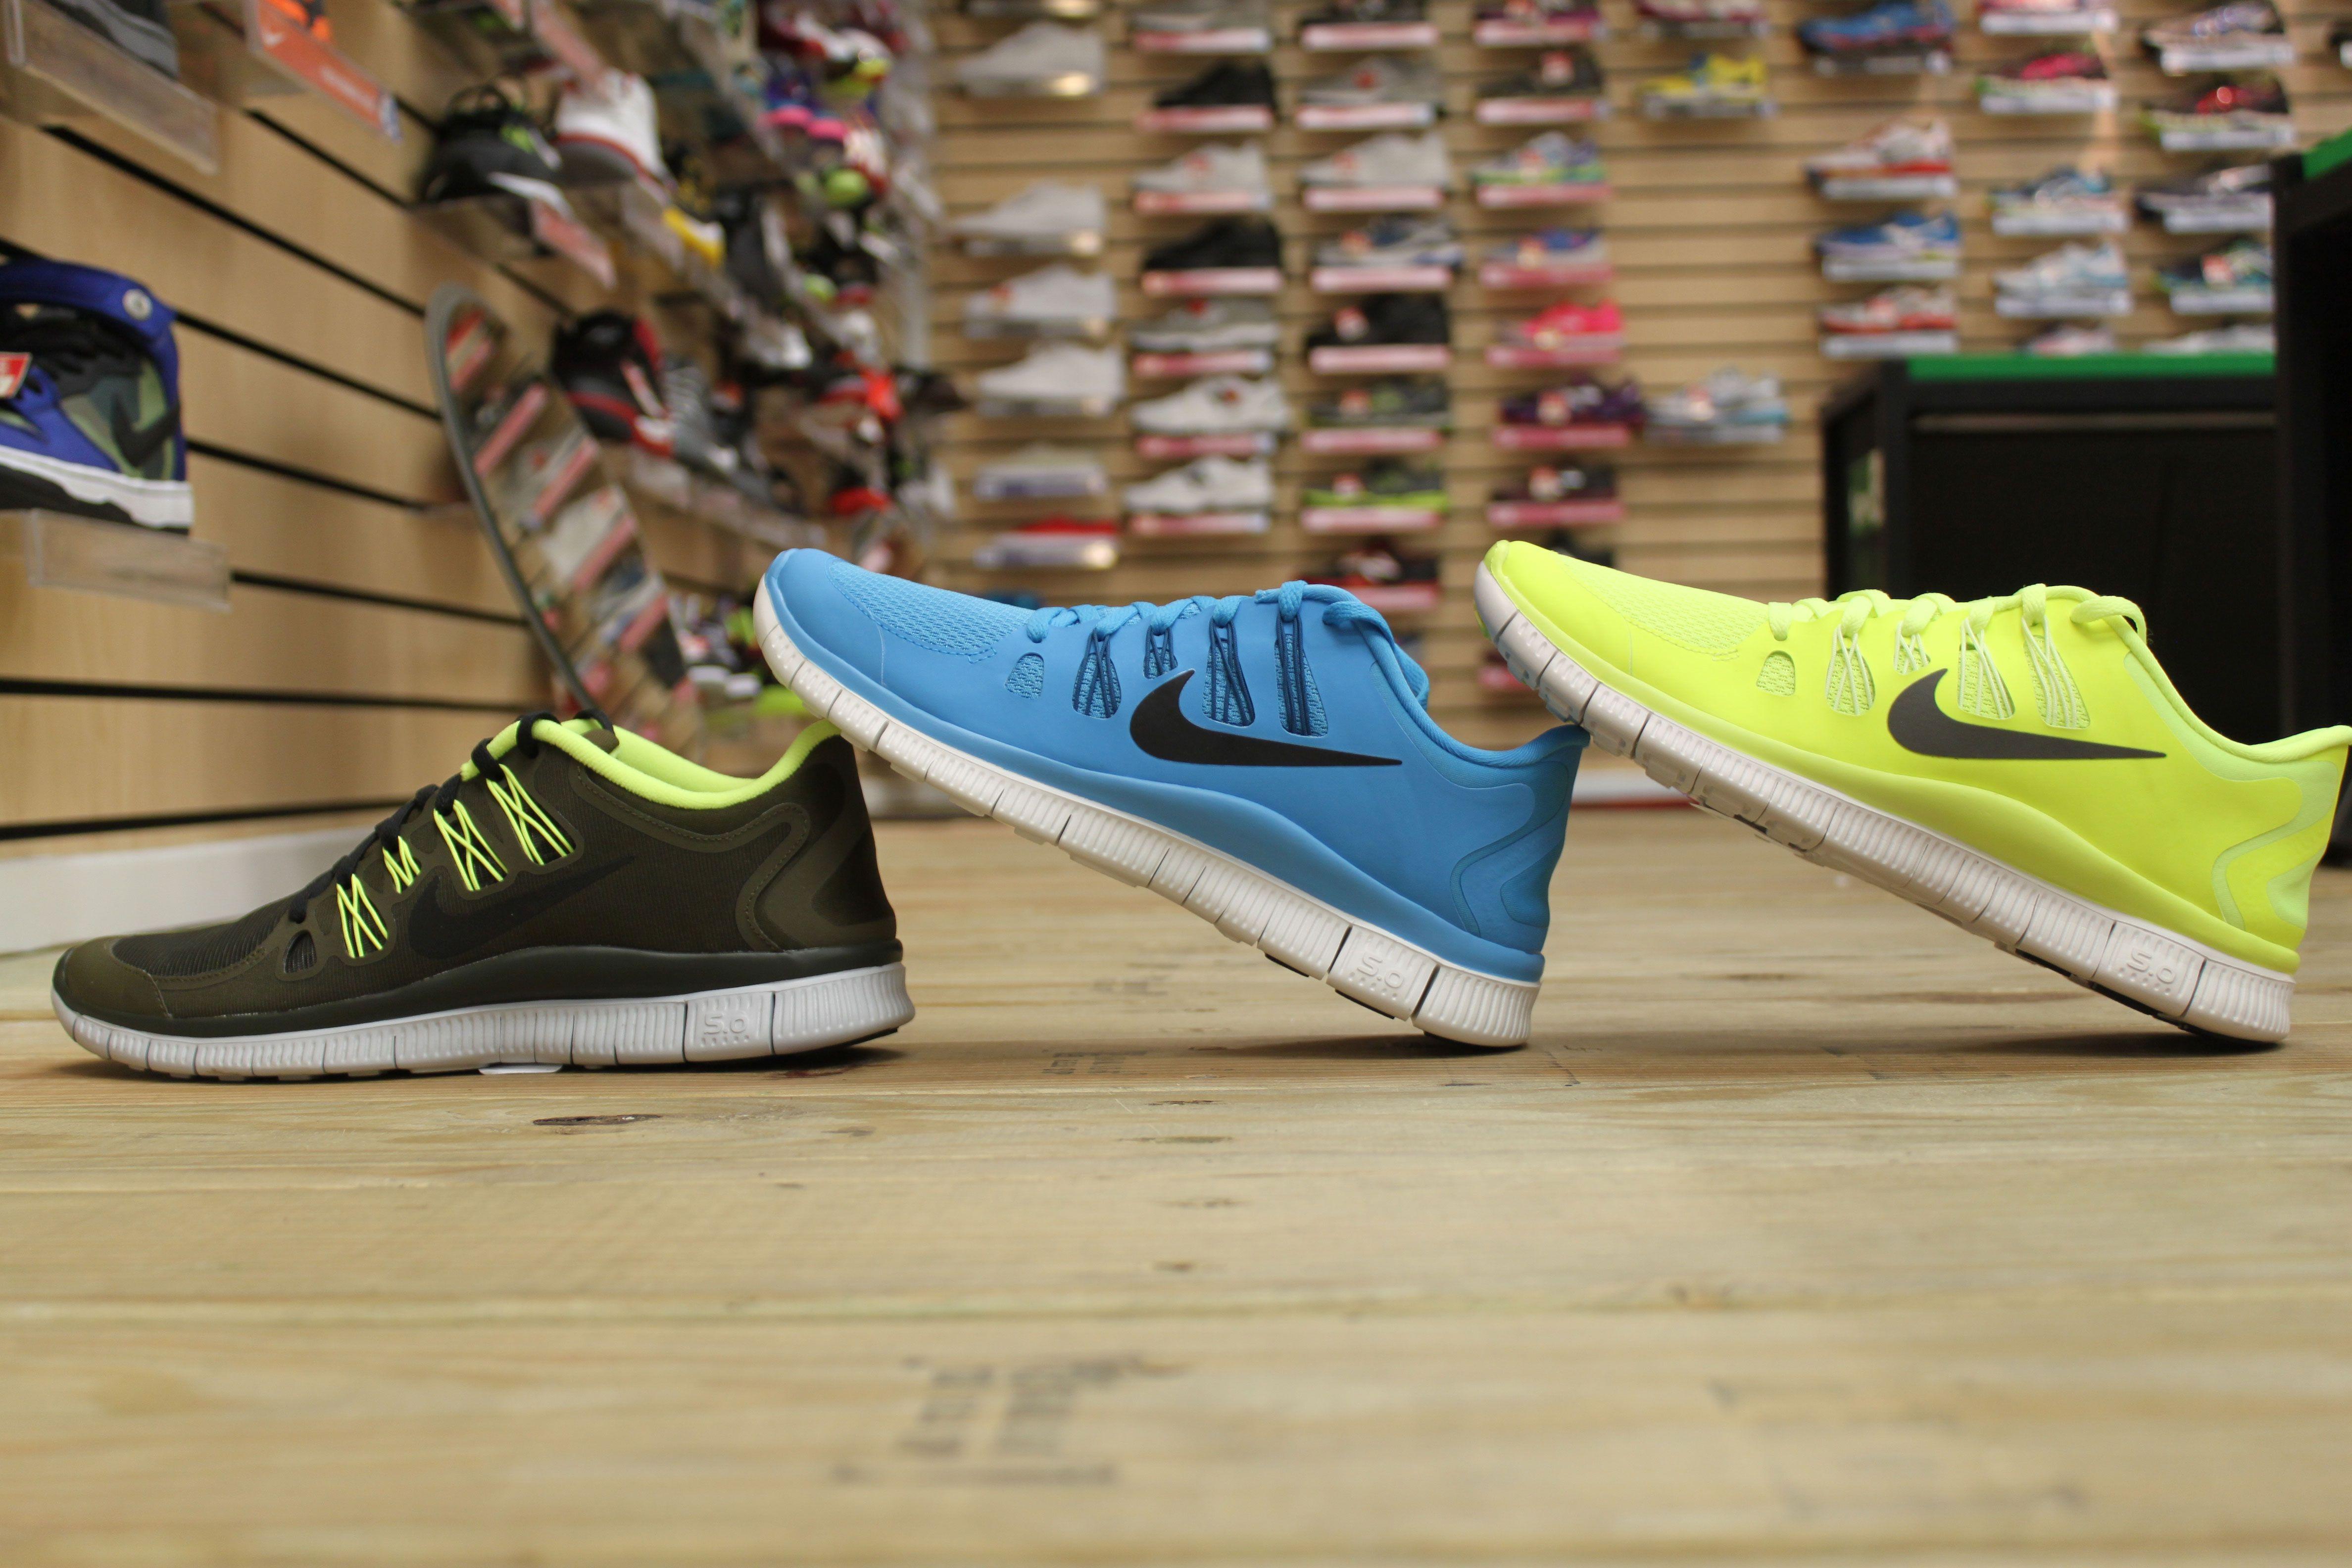 nike free 5.0 l james shoes